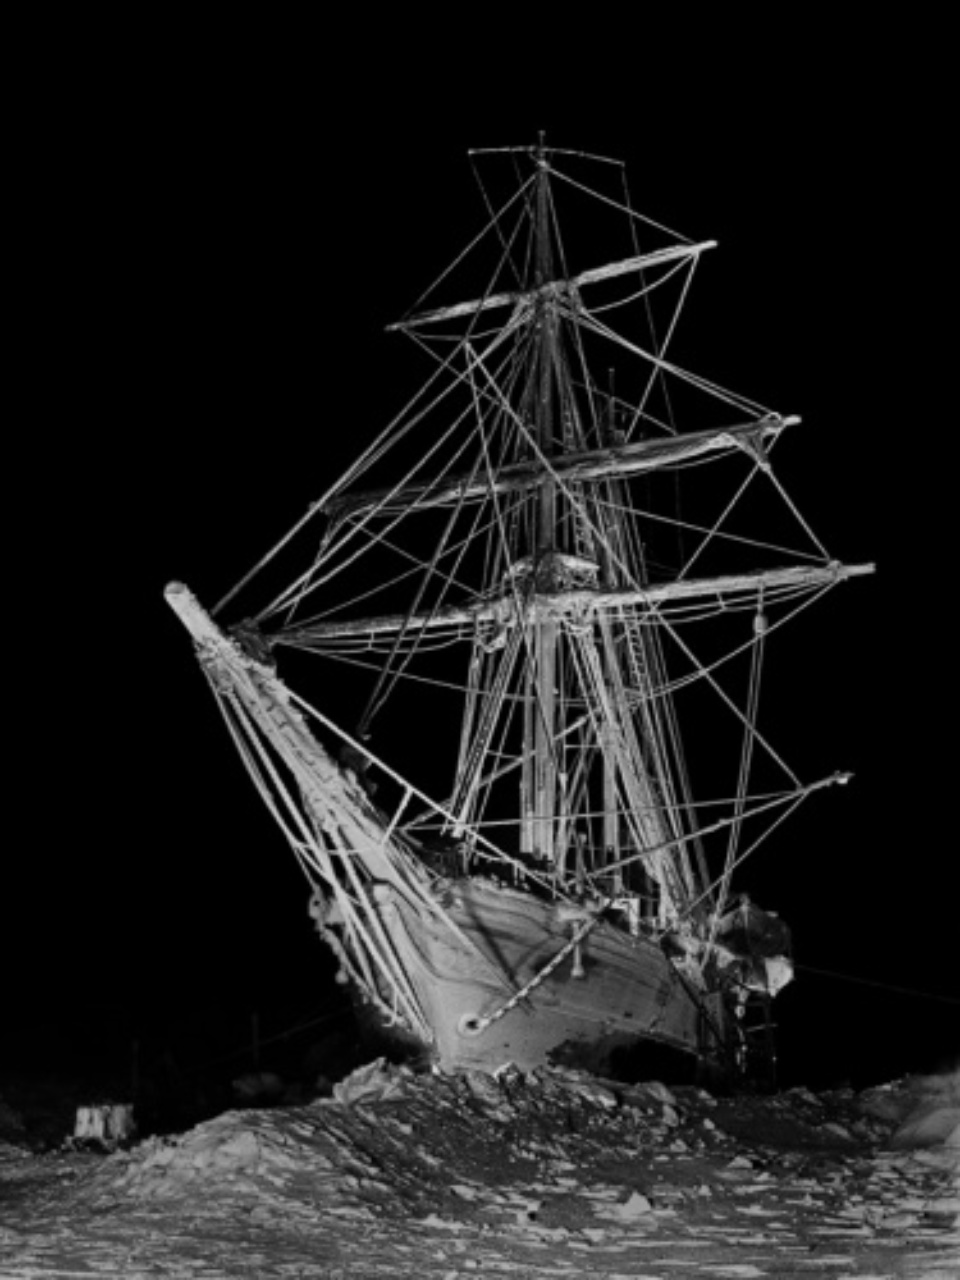 Frank Hurley Endurance in Full Sail 1915